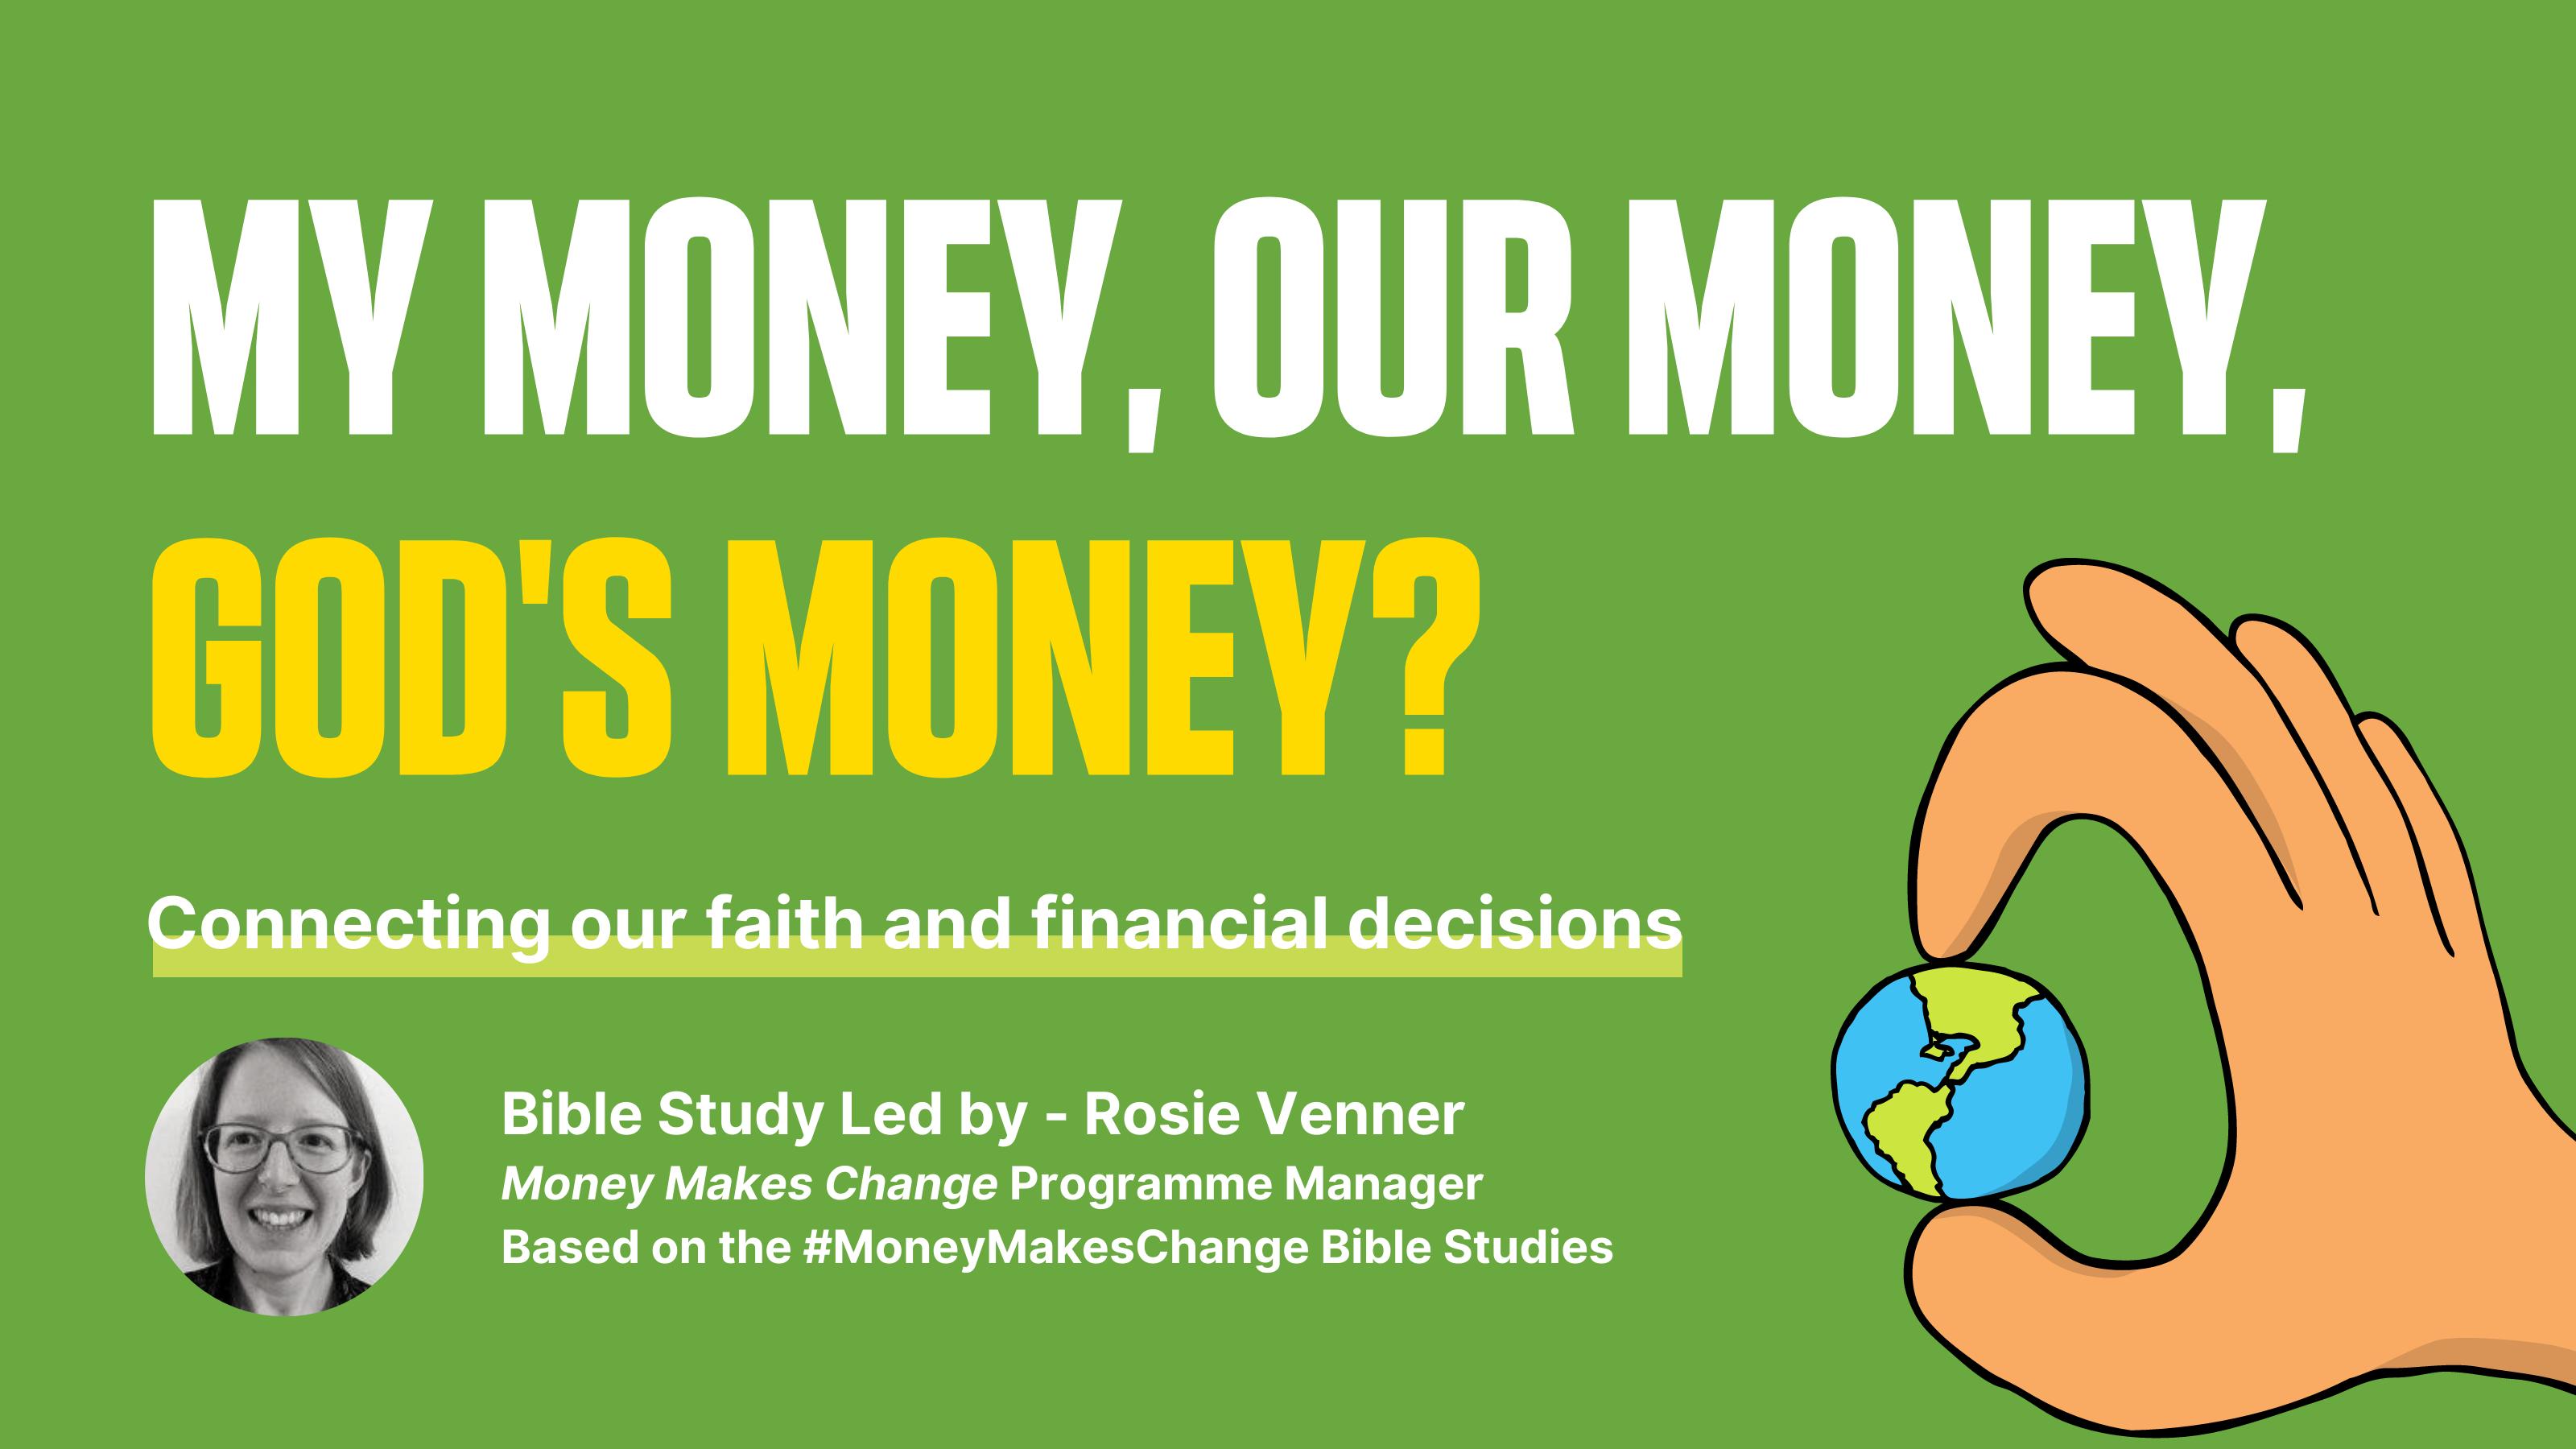 Money Makes Change Bible Study – My money, our money, God's money?